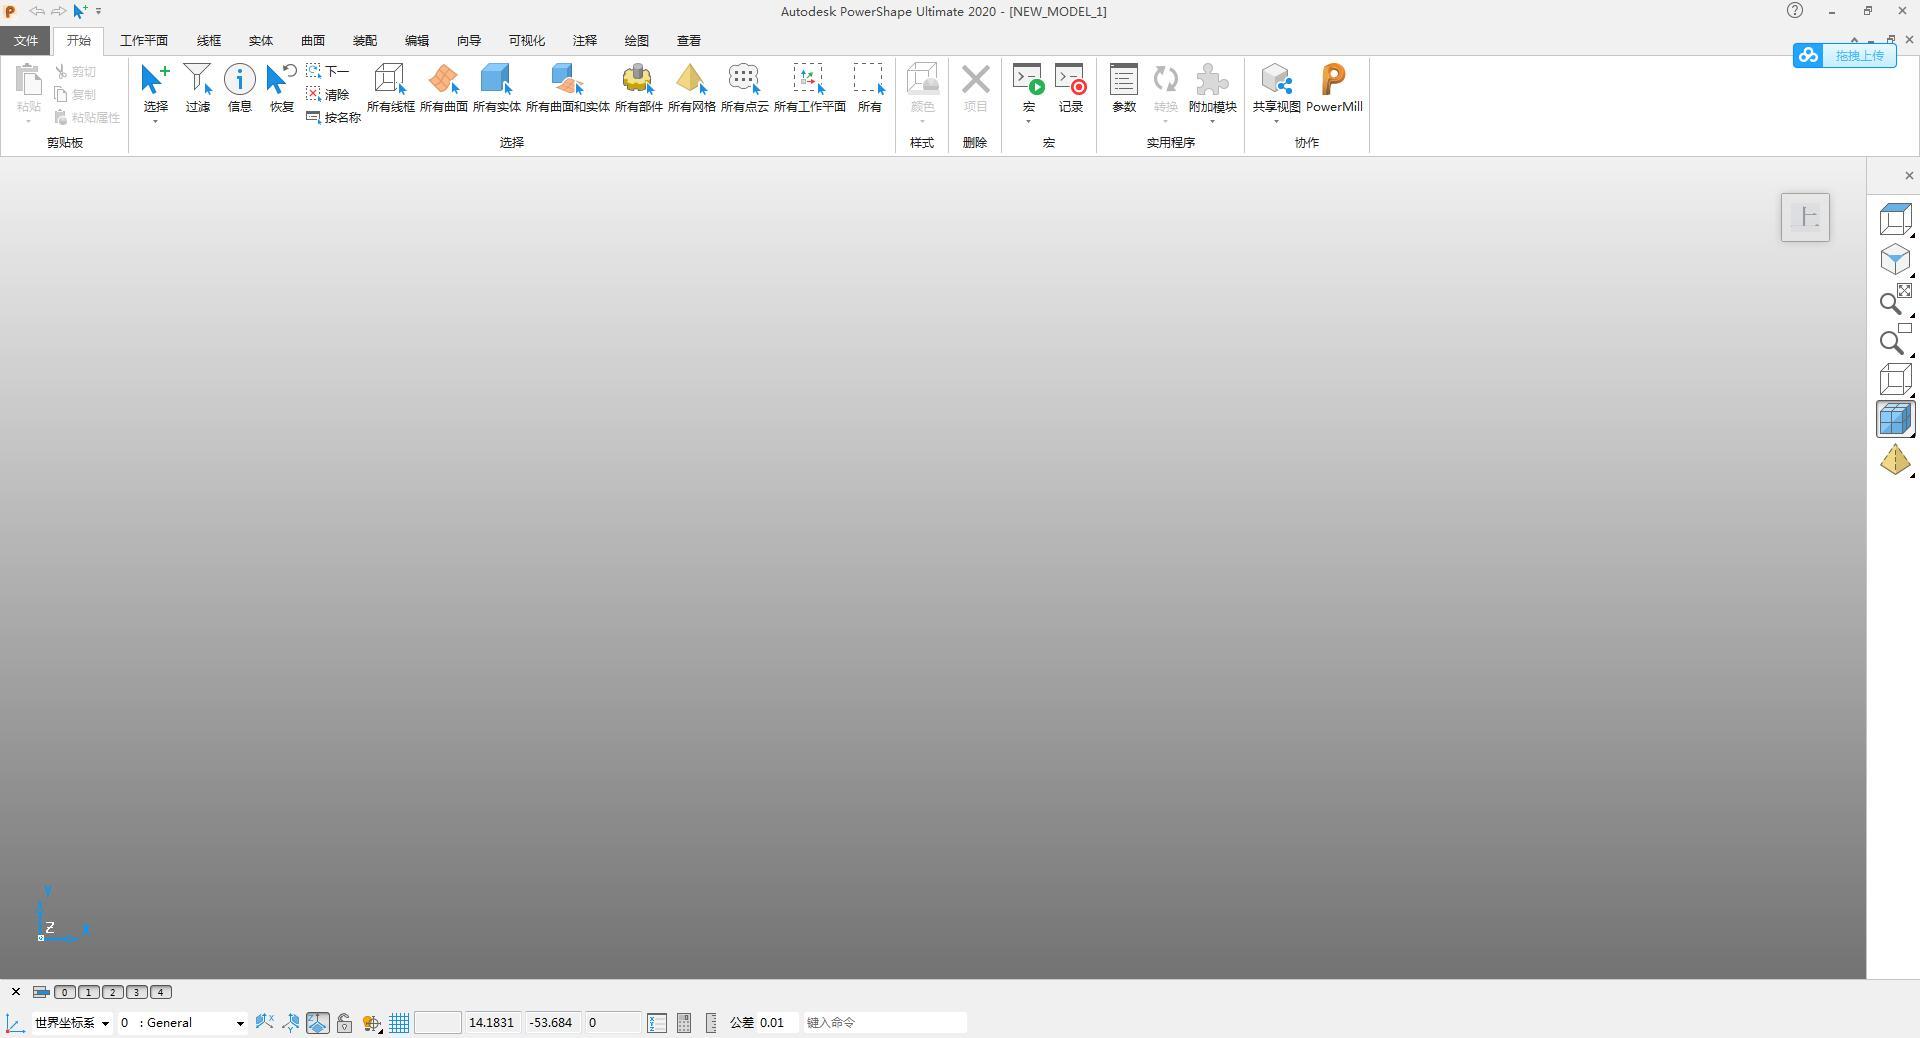 Autodesk Powershape Ultimate 2020官方下载【Powershape 2020破解版】中文破解版插图3